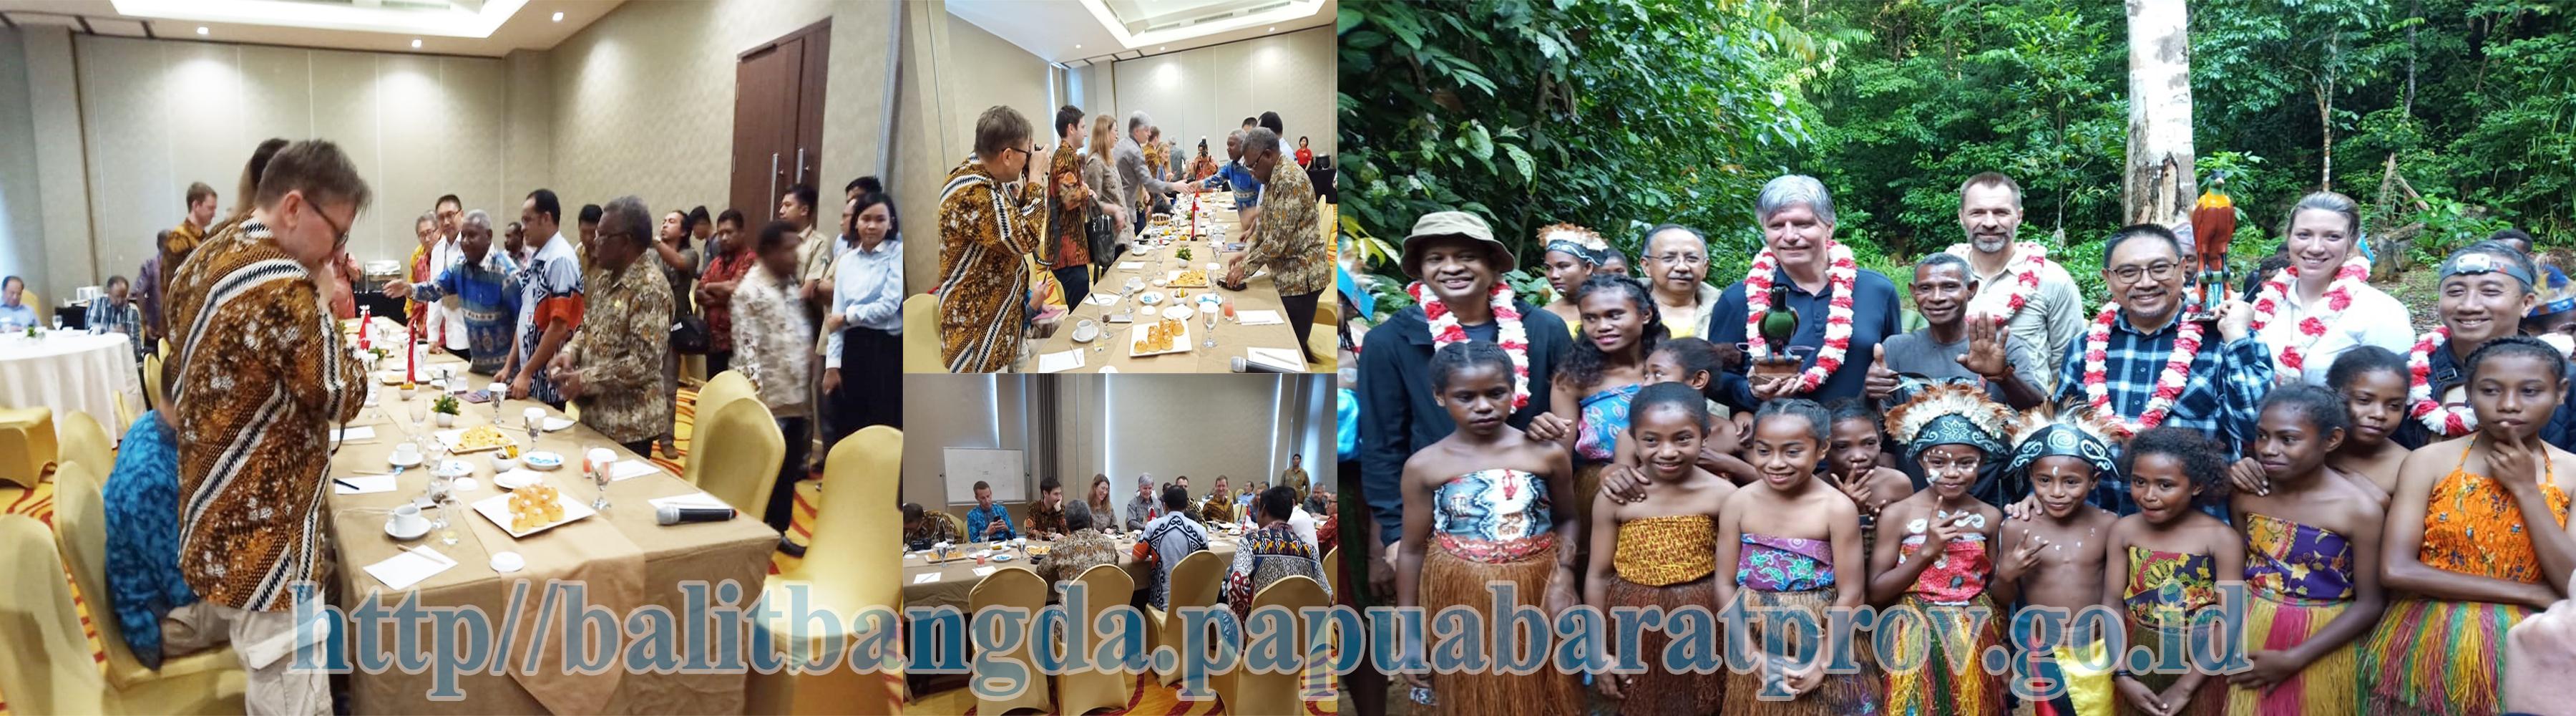 Sambutan Selamat Datang Gubernur Papua Barat kepada Rombongan Mentri Iklim dan Lingkungan Hidup Kerajaan Norwegia di Sorong Papua Barat